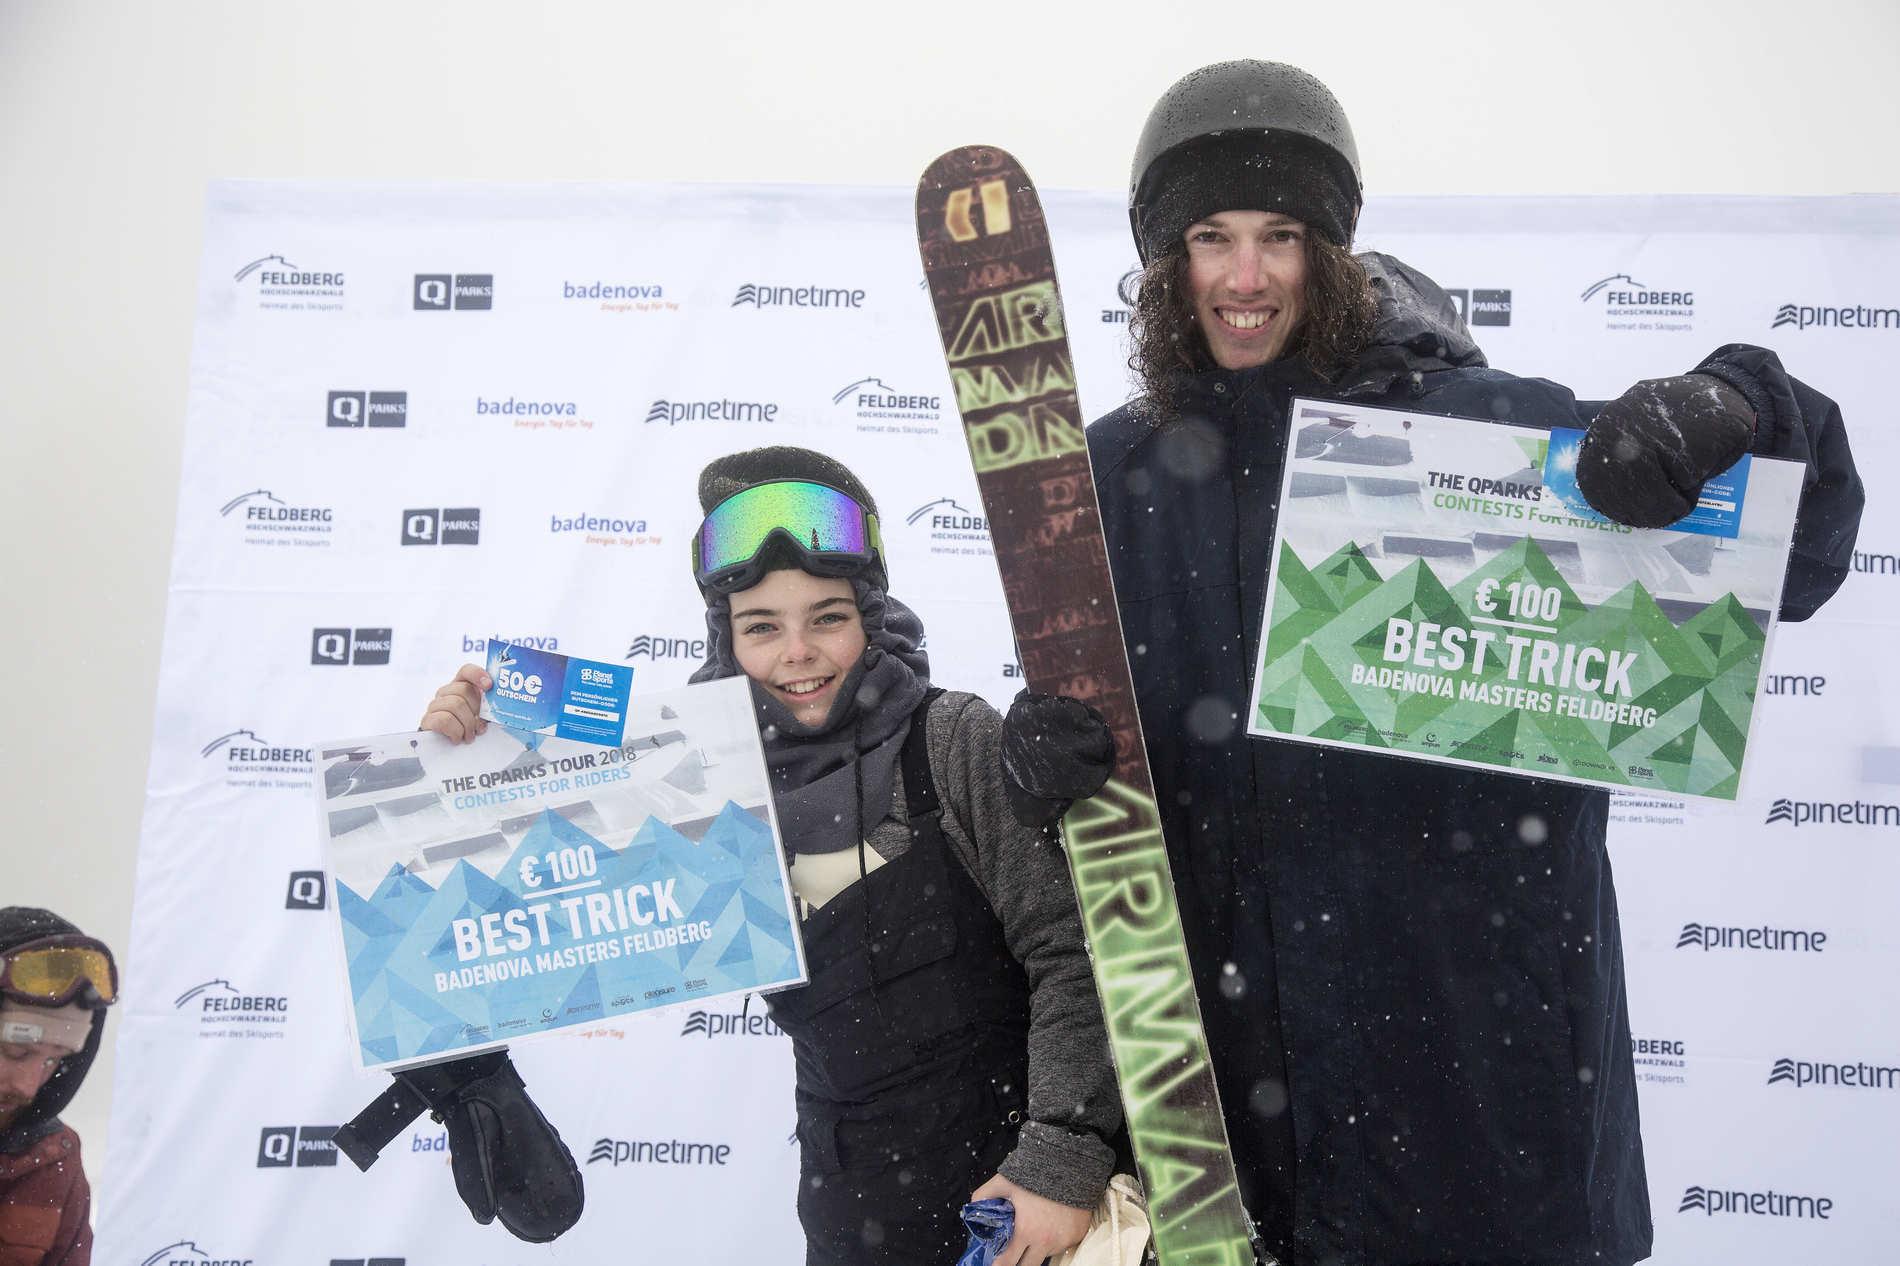 web snowpark feldberg 17 02 2018 lifestyle fs sb martin herrmann qparks 22